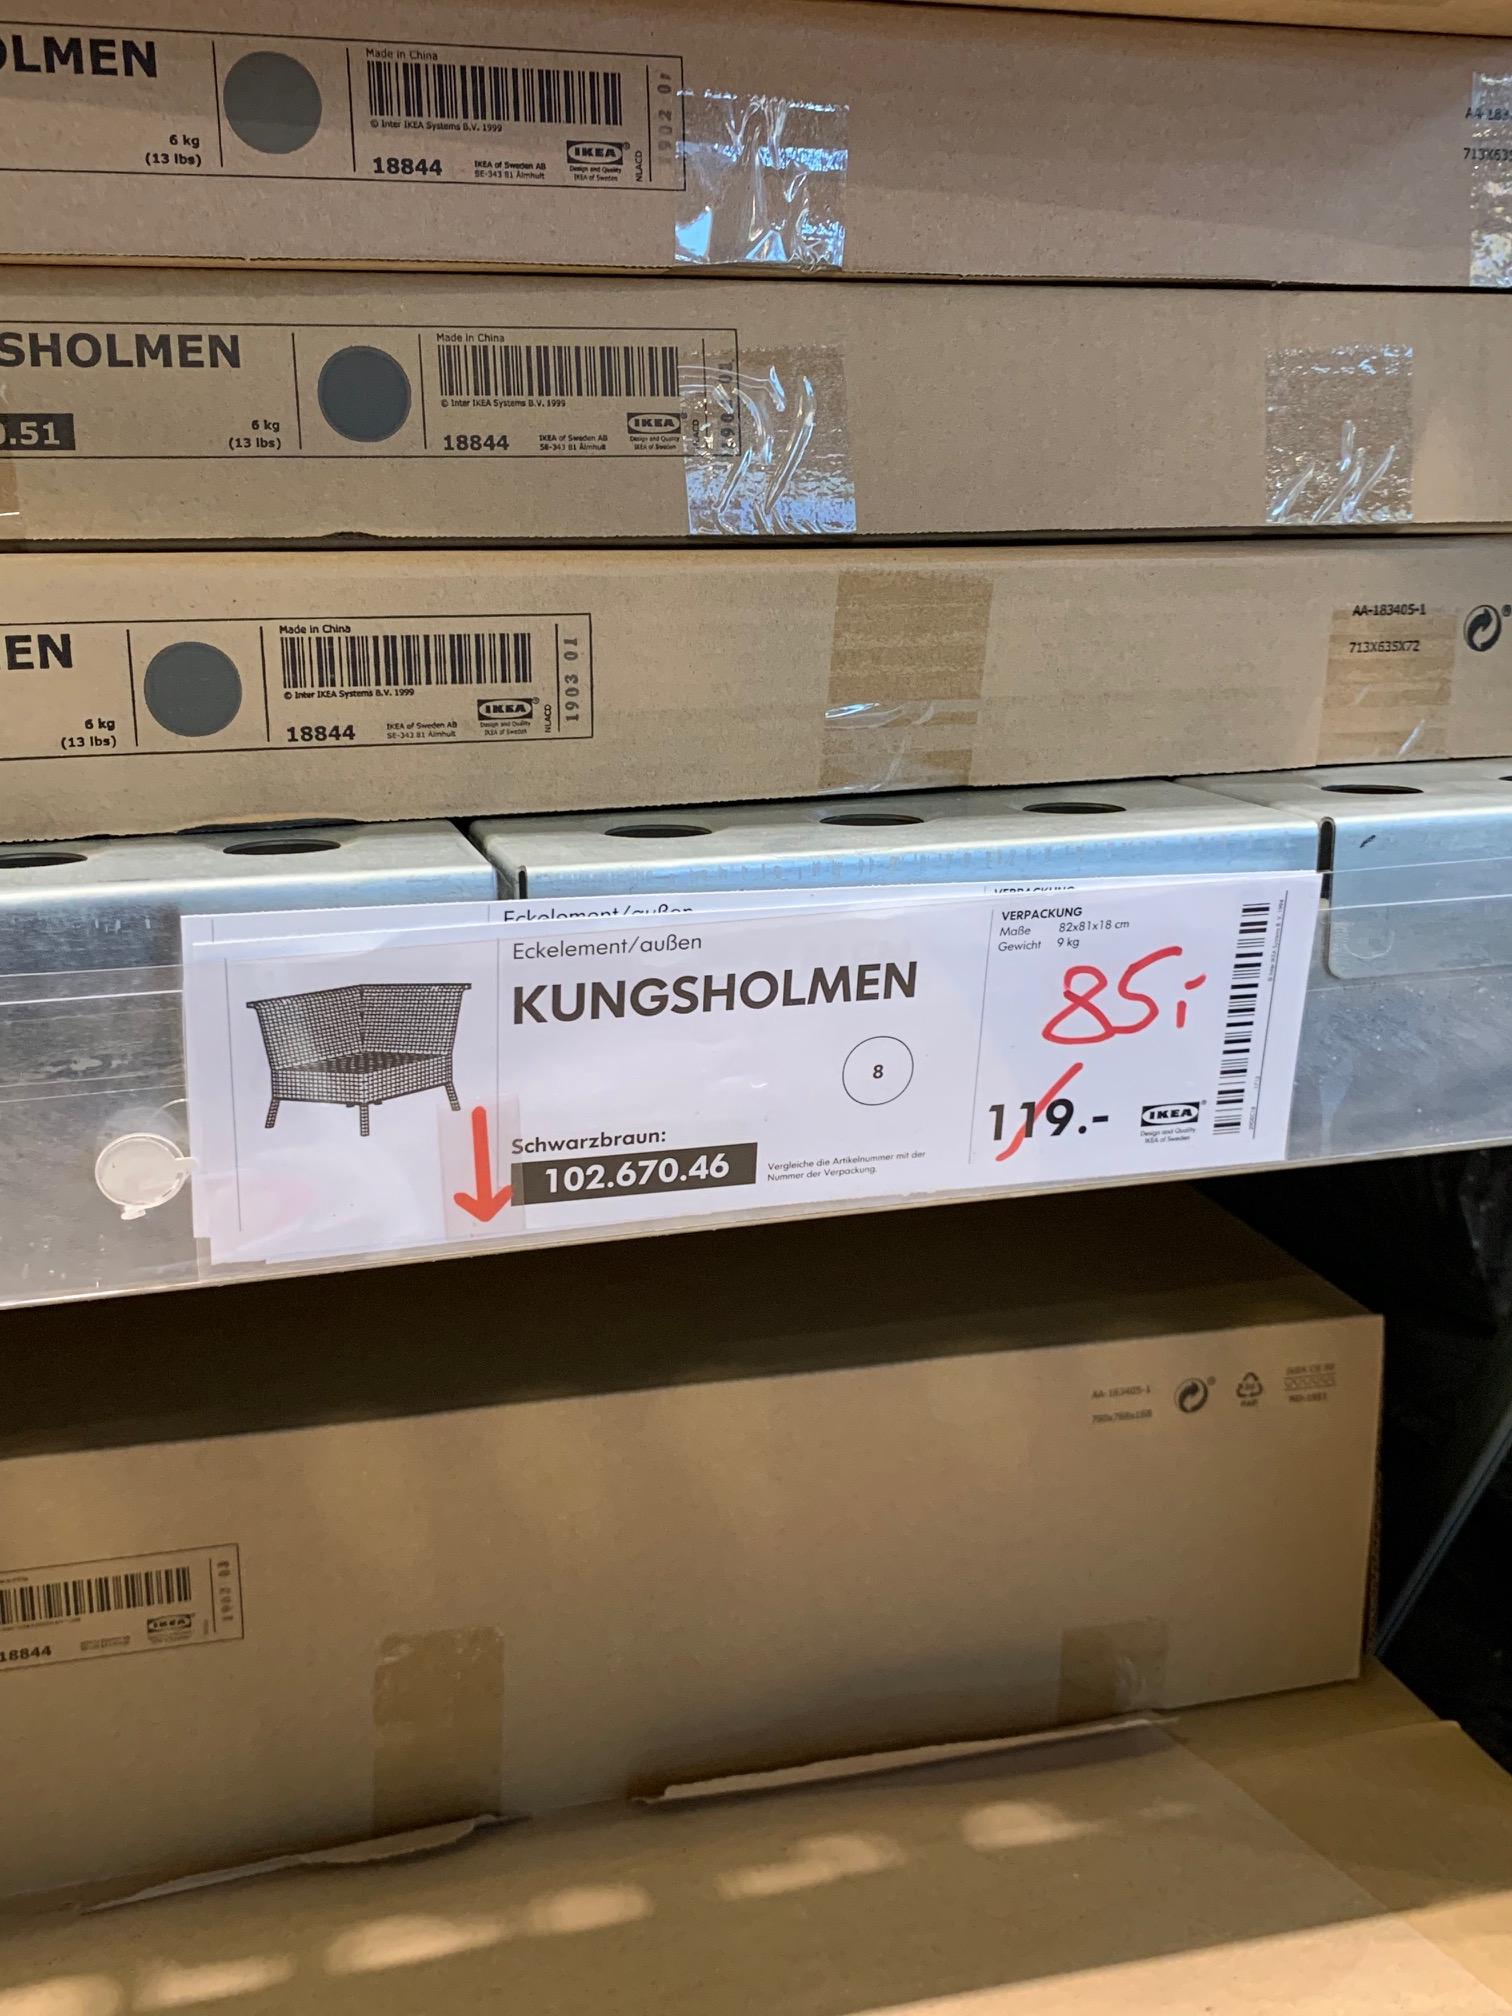 [Lokal IKEA Berlin Lichtenberg] Diverse KUNGSHOLMEN Garten-/Terrassenmöbel reduziert, z.B. Sitzelement für 59€ statt 100€